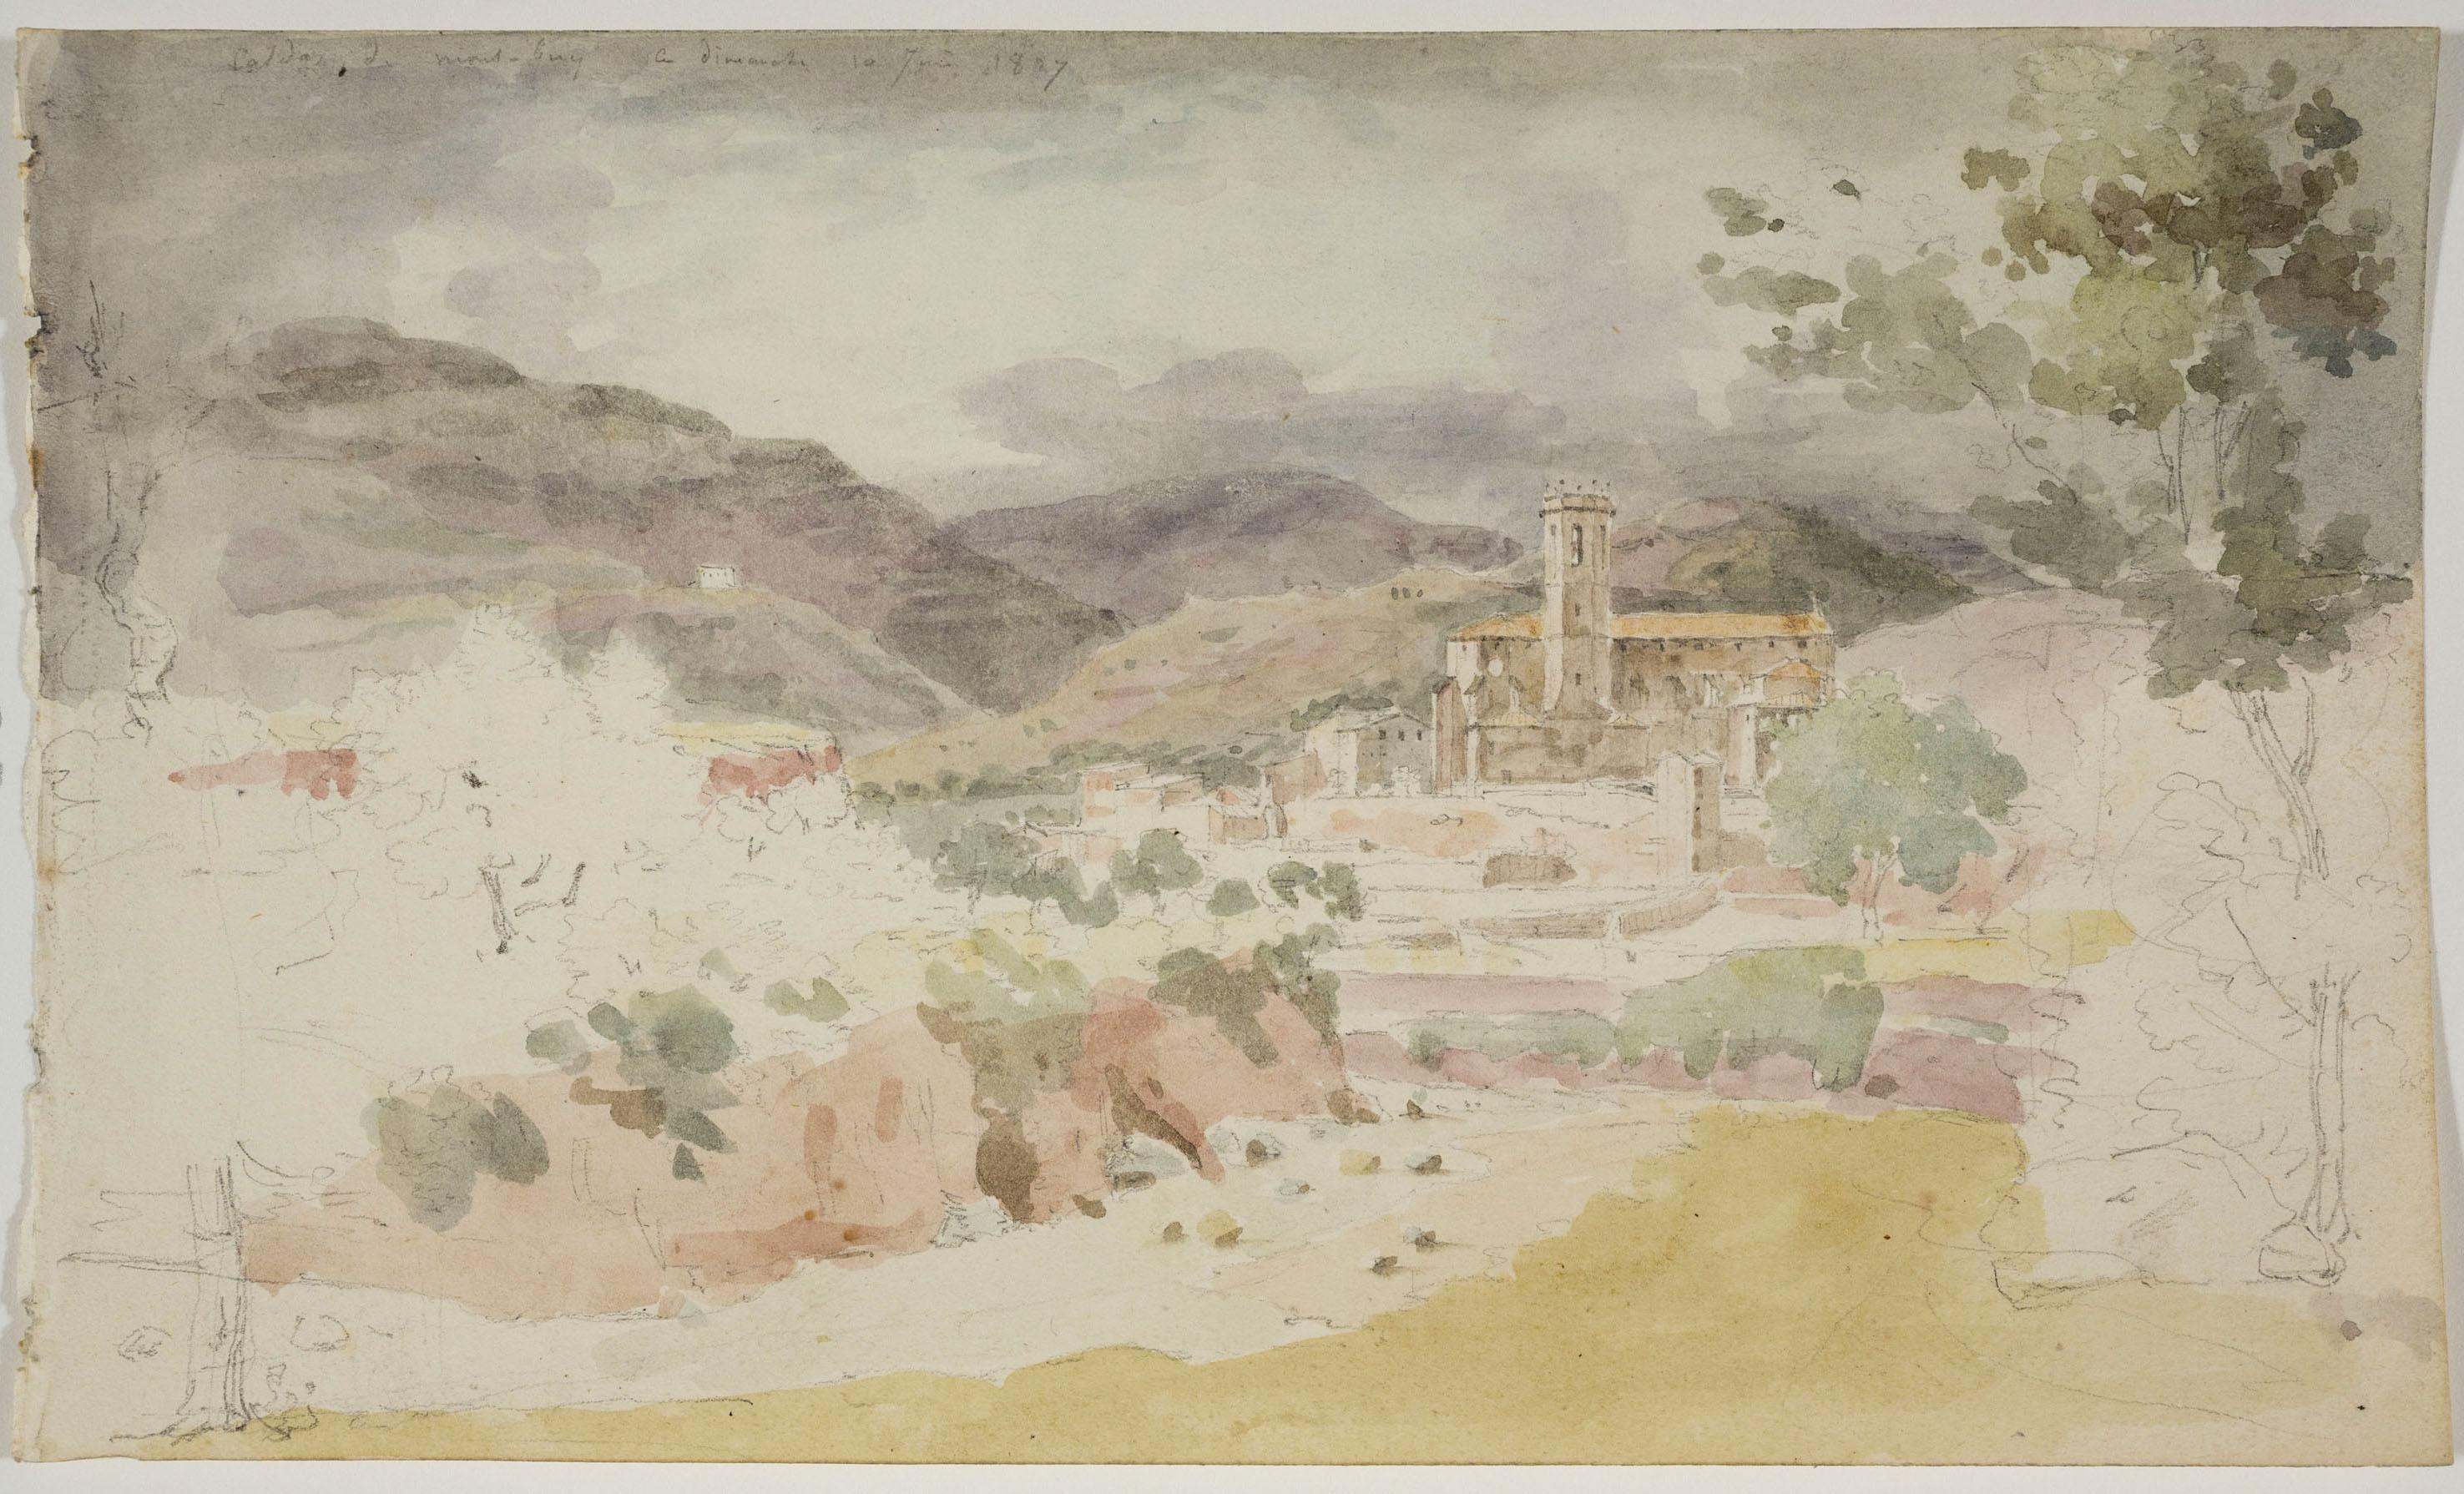 Adolphe Hedwige Alphonse Delamare - View of Caldes de Montbui - Sunday, June 10, 1827